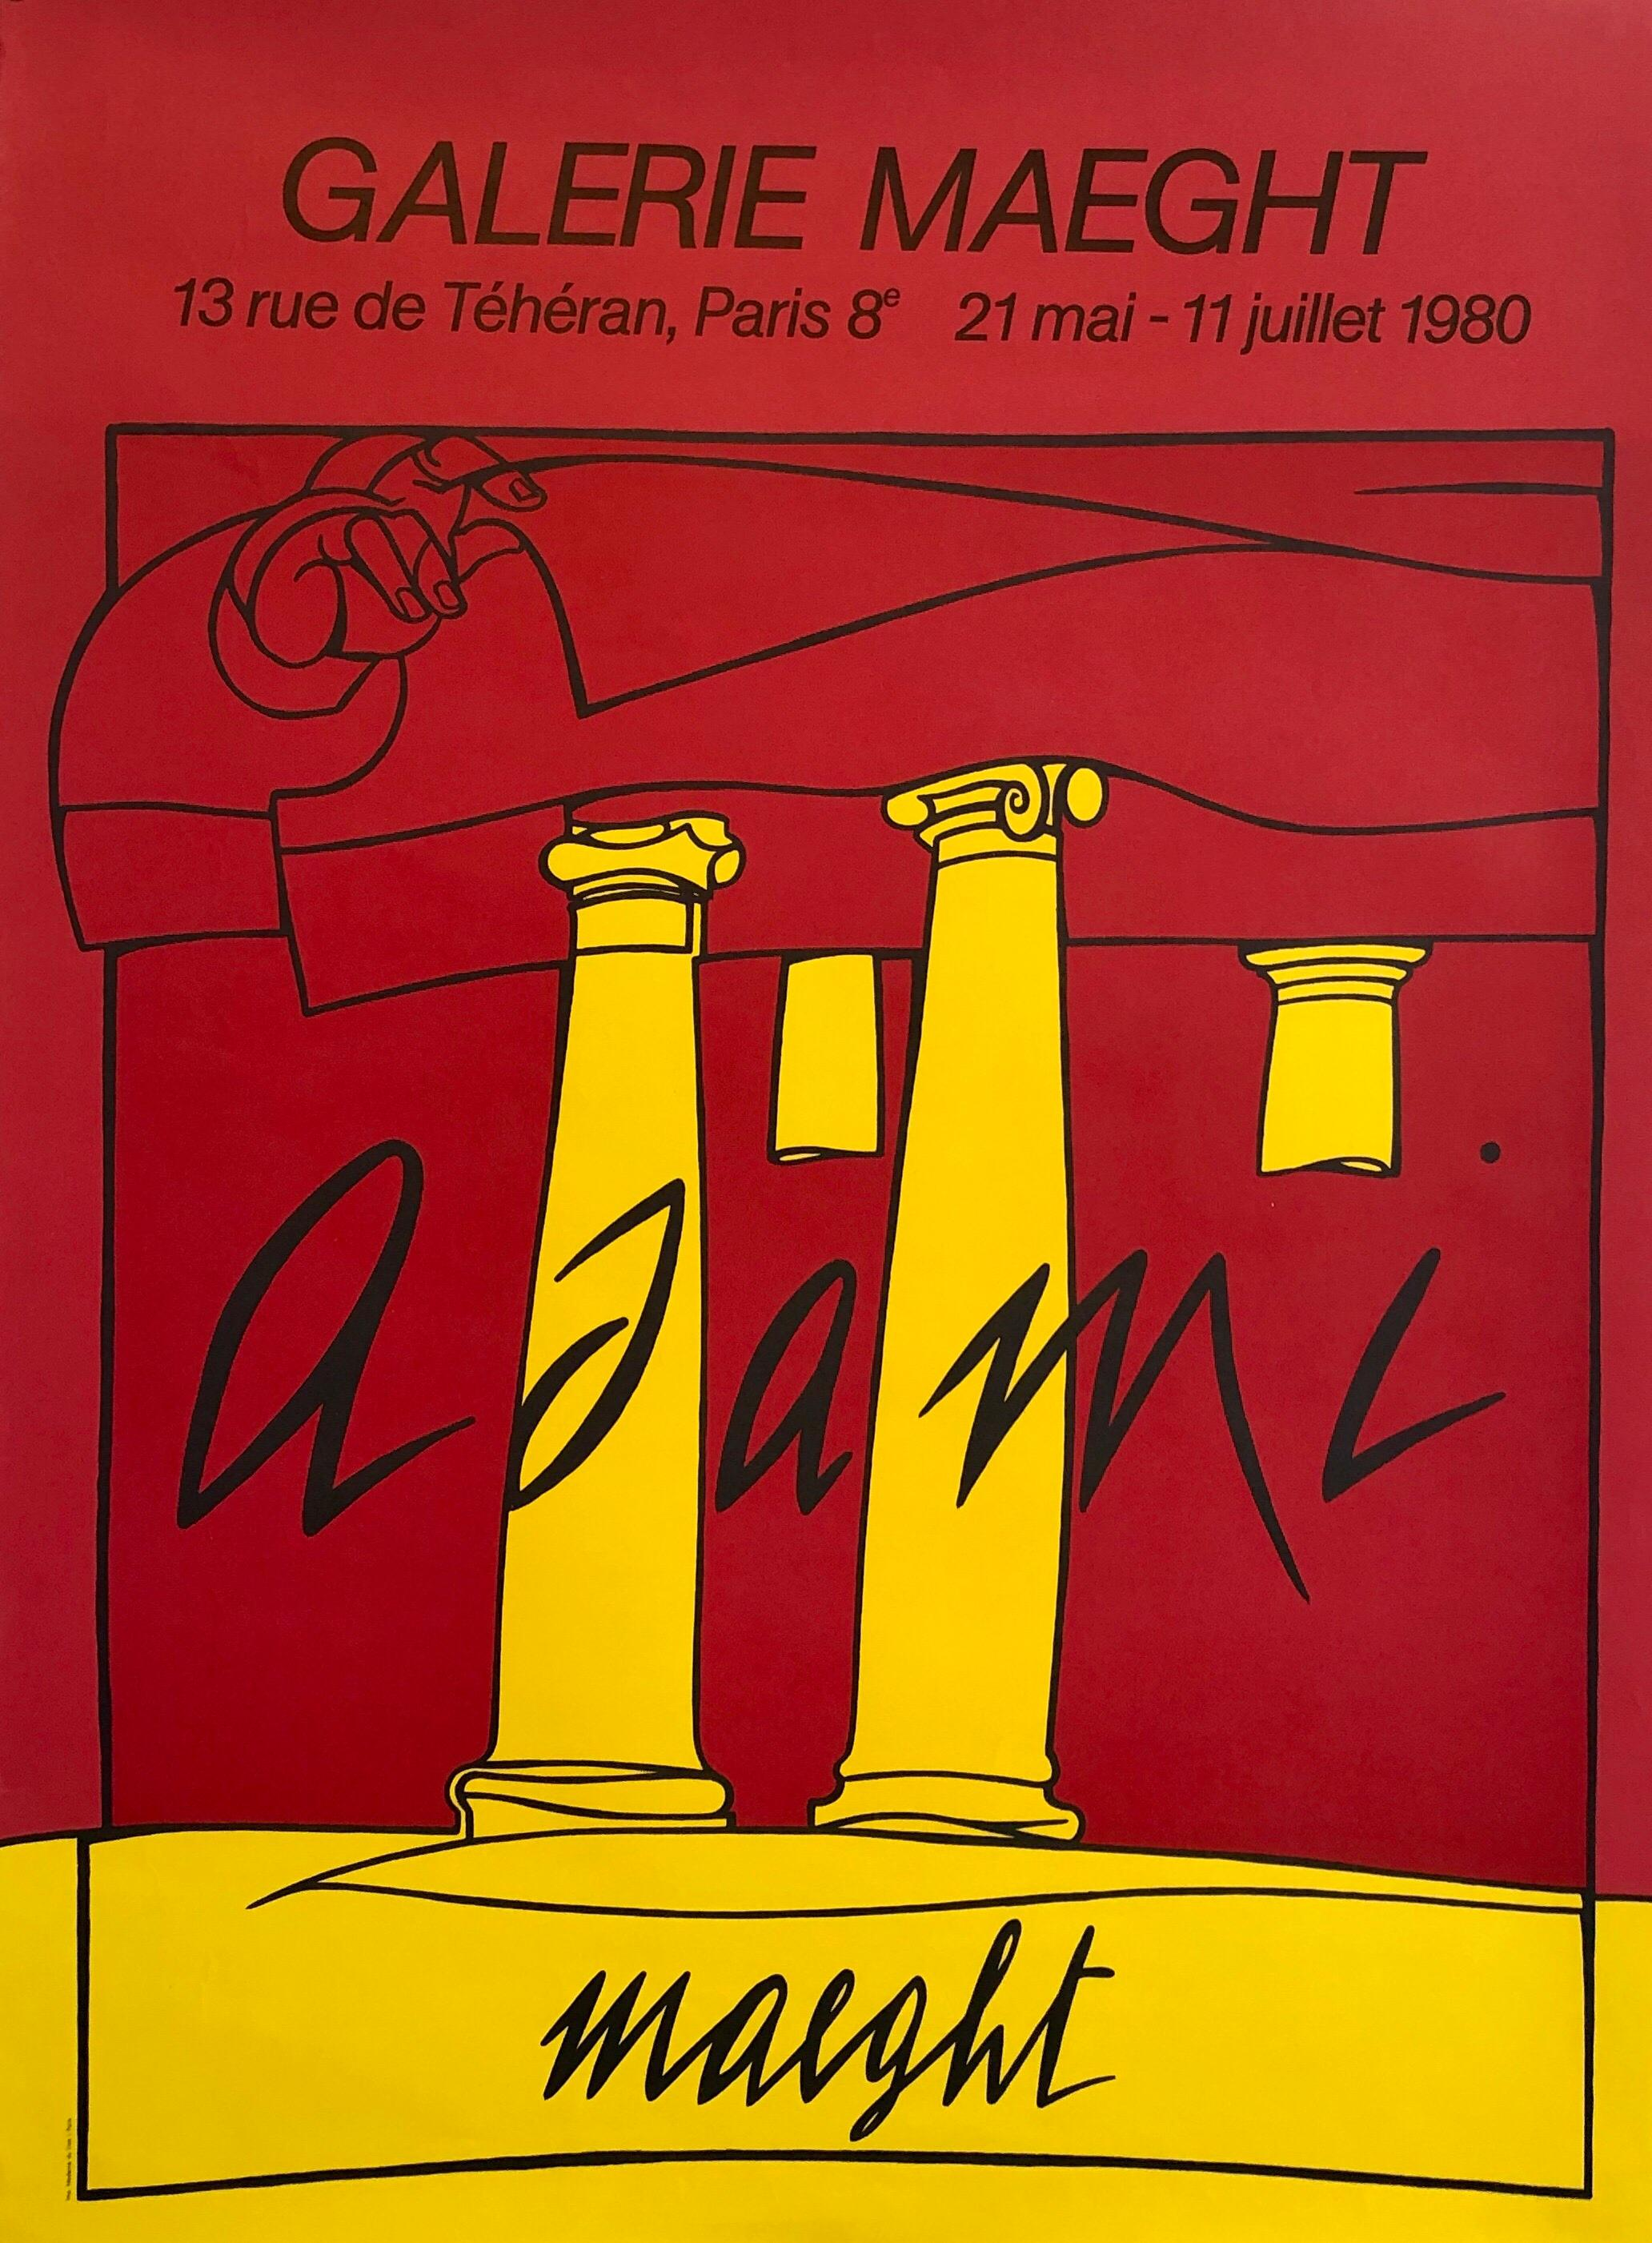 Italian Post Modern Pop Art Lithograph Vintage Poster Memphis Galerie Maeght